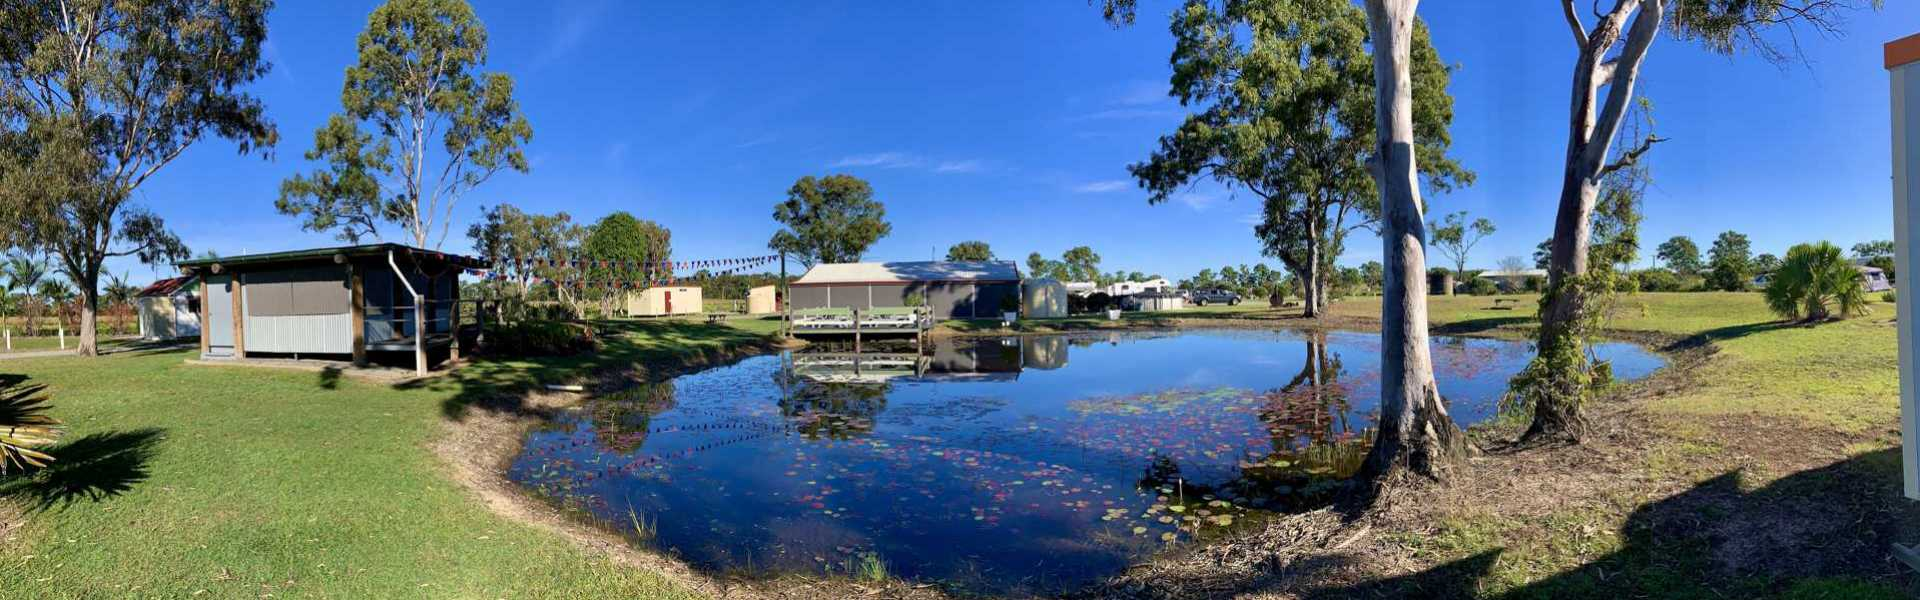 Cheery Nomad RV Park Farmstay Lake 1